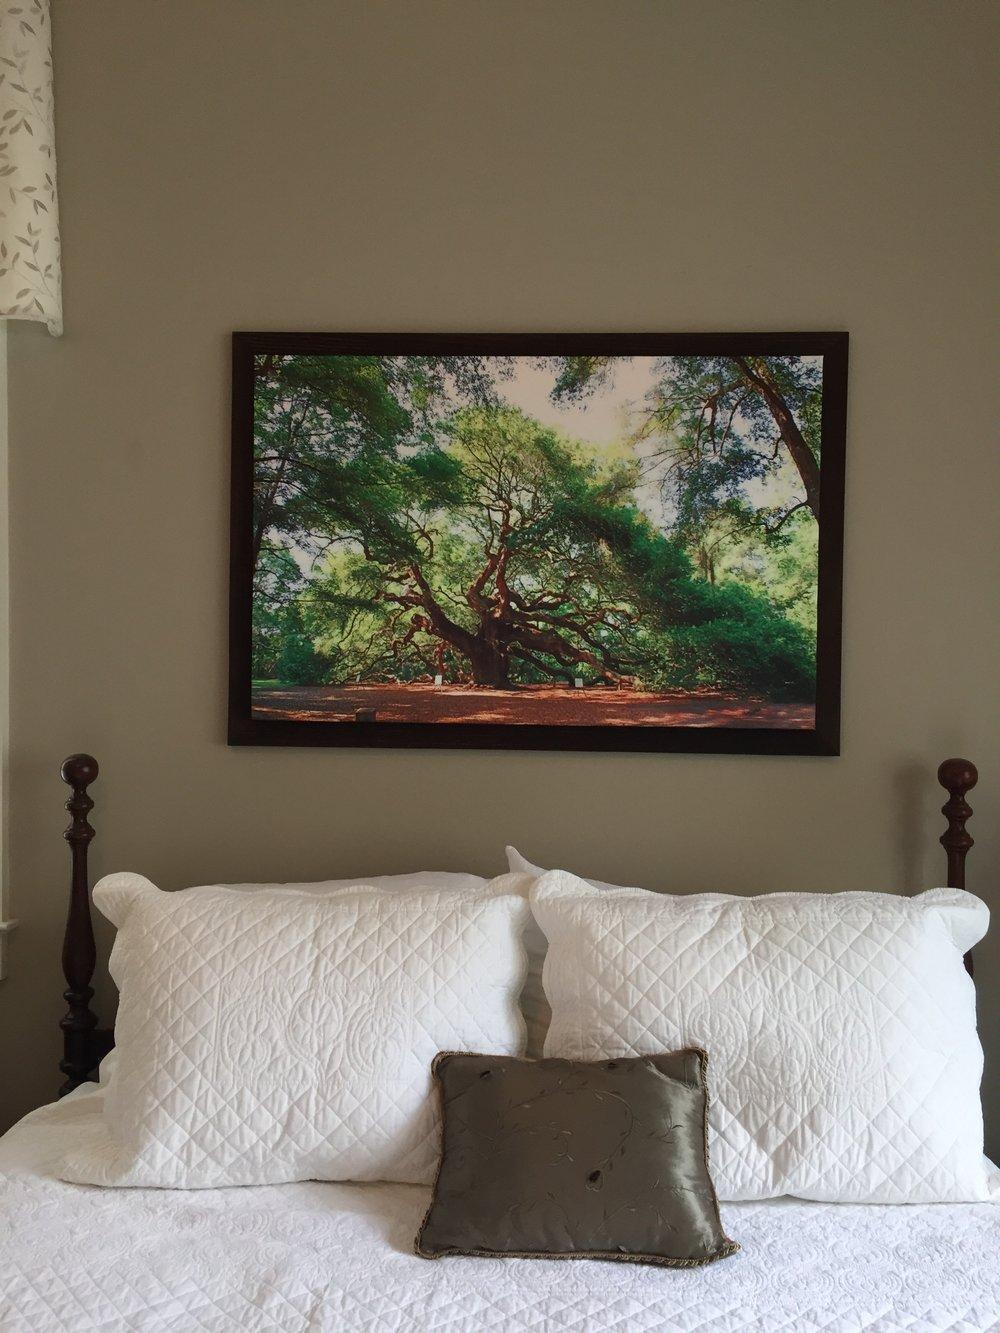 "Framed 26"" x 40"" over Queen Bed"